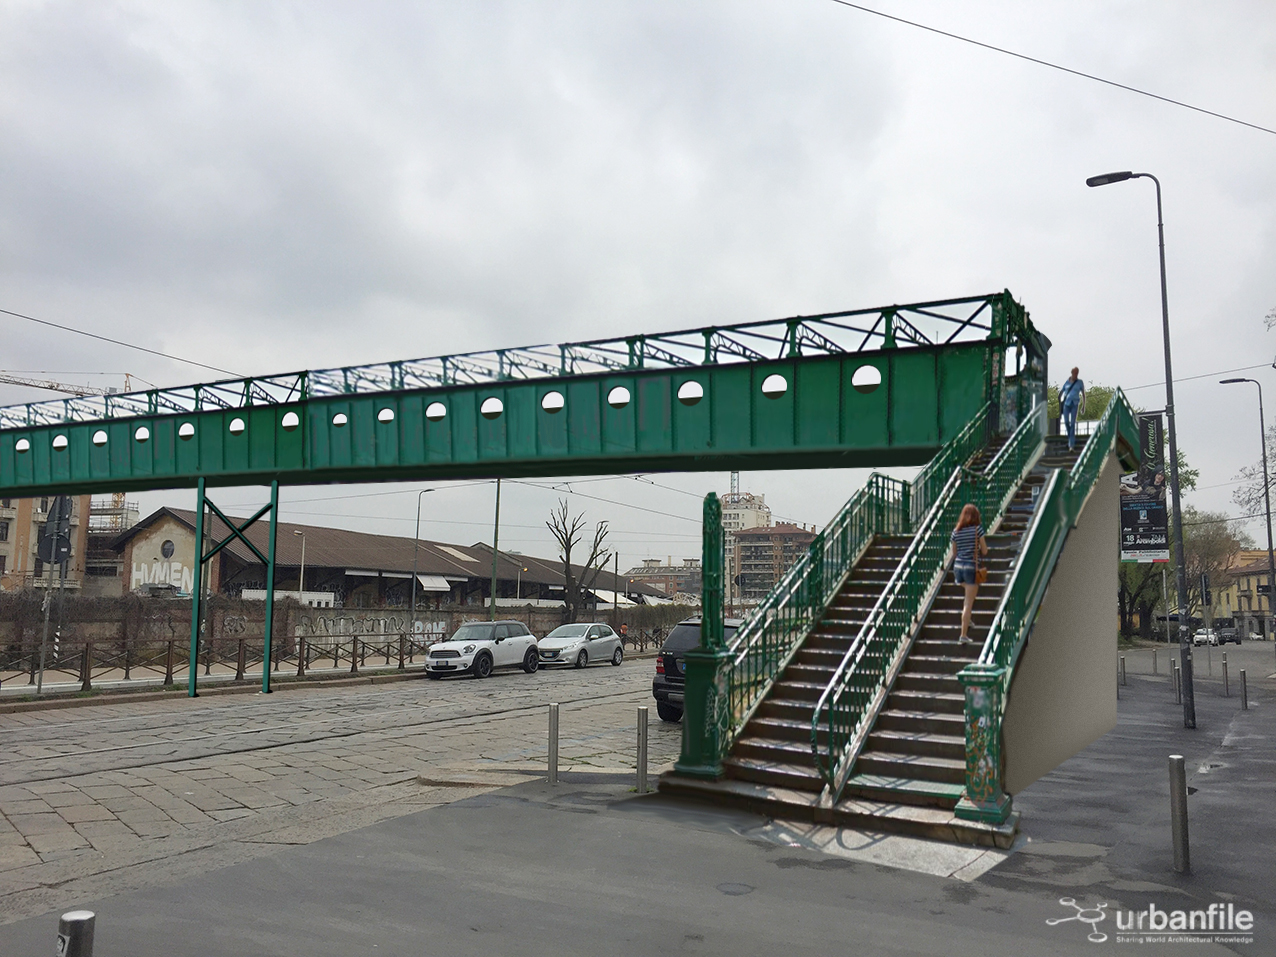 Milano porta genova il ponte icona di via tortona che - Carabinieri porta genova milano ...